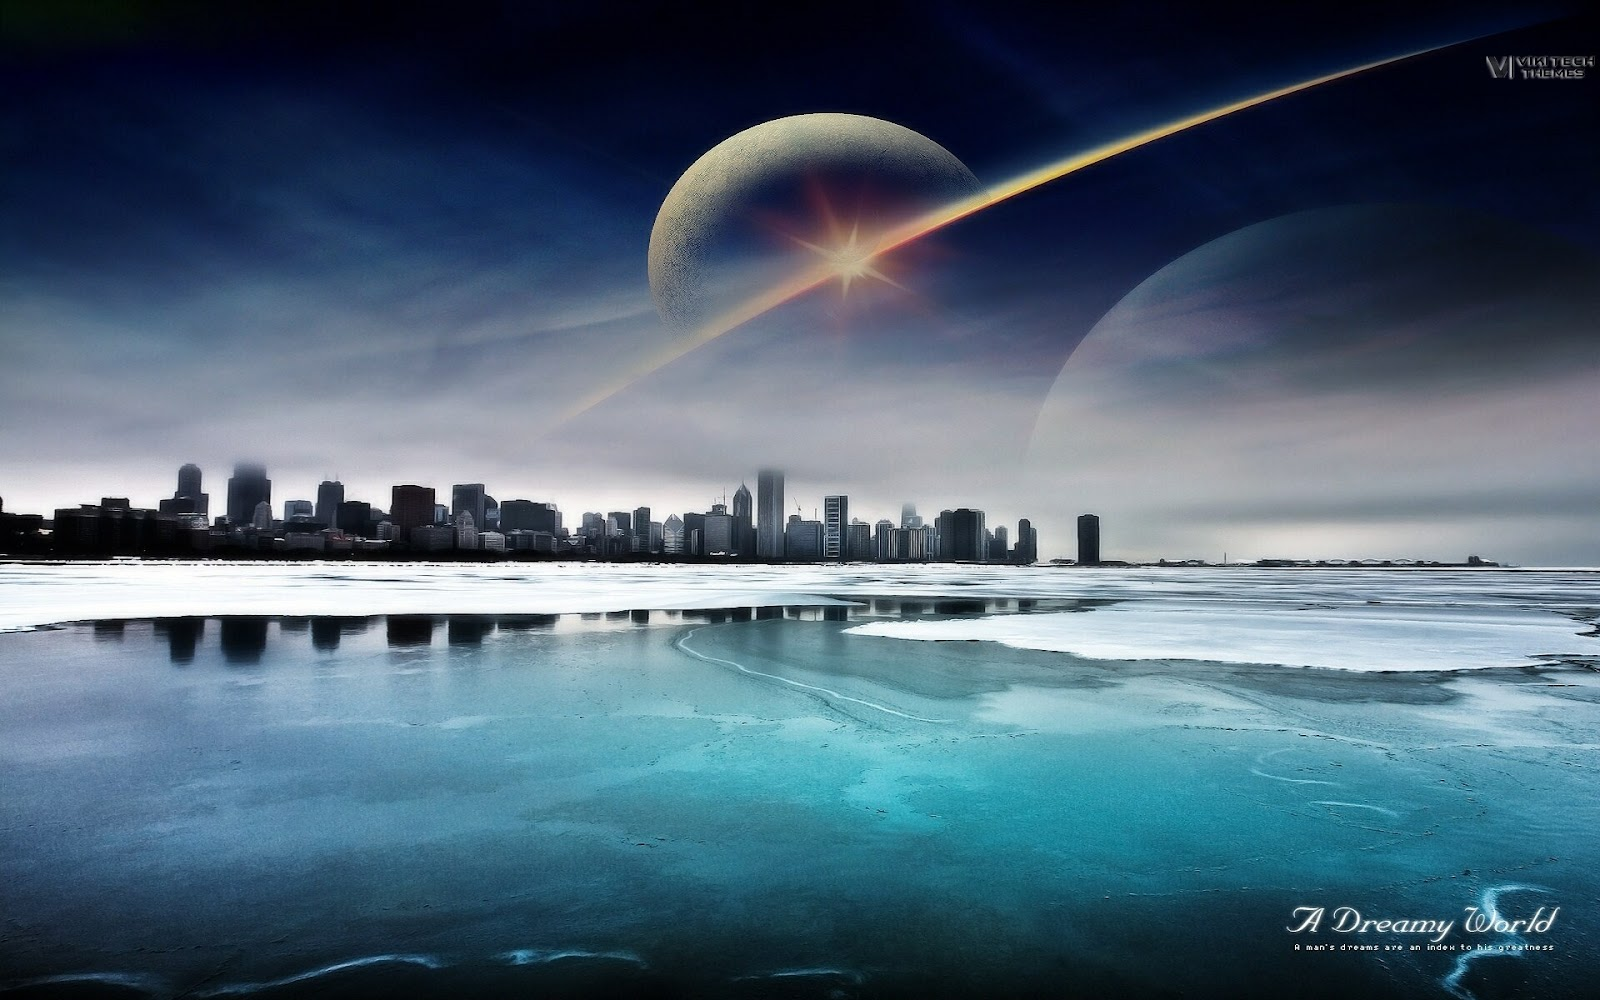 http://4.bp.blogspot.com/_BwufdwehS5s/TQAQ2J1QJ_I/AAAAAAAAAHk/IrktghH-2fw/s1600/planeta-tierra-hd-andresfanaticoblog30.jpg